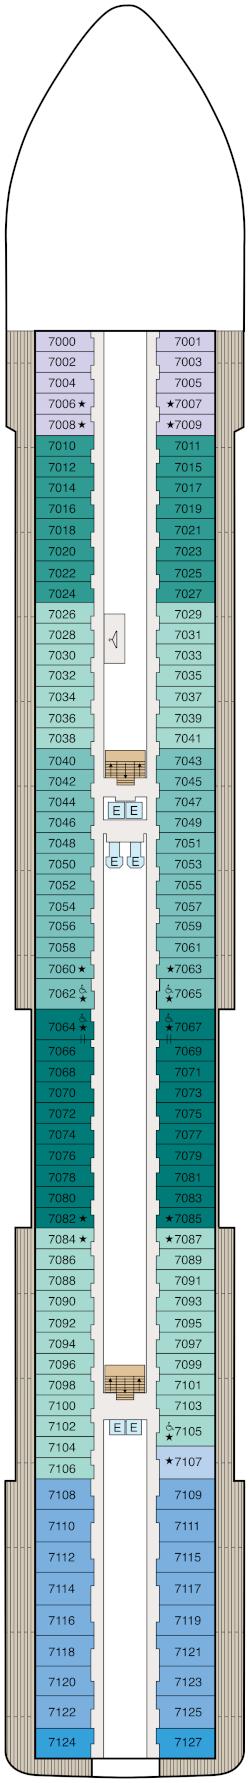 Vista Deck 7 Deck Plan